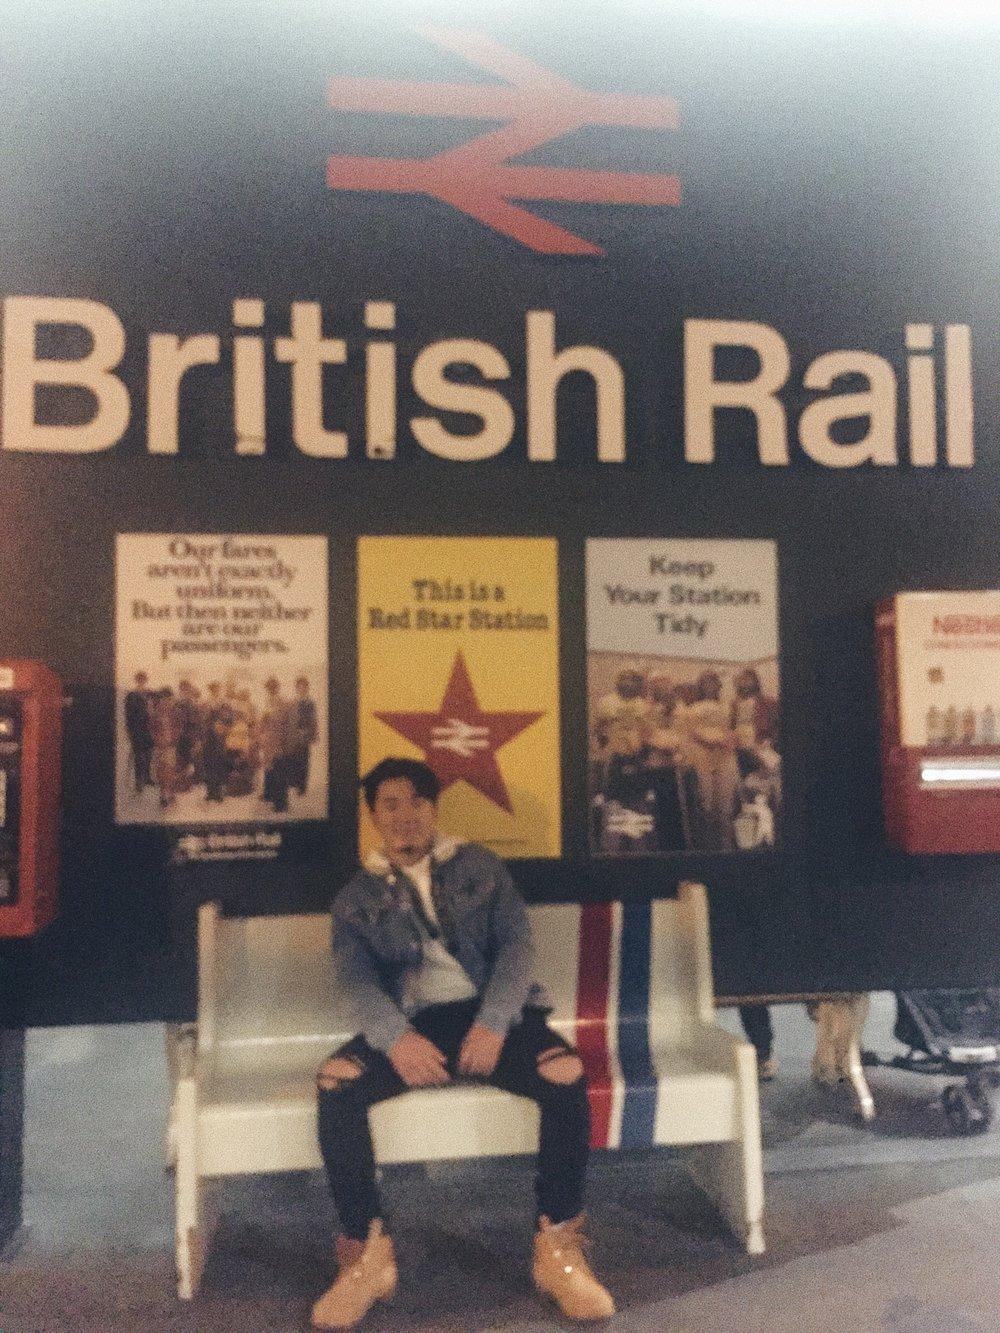 National railway museum 2.jpg